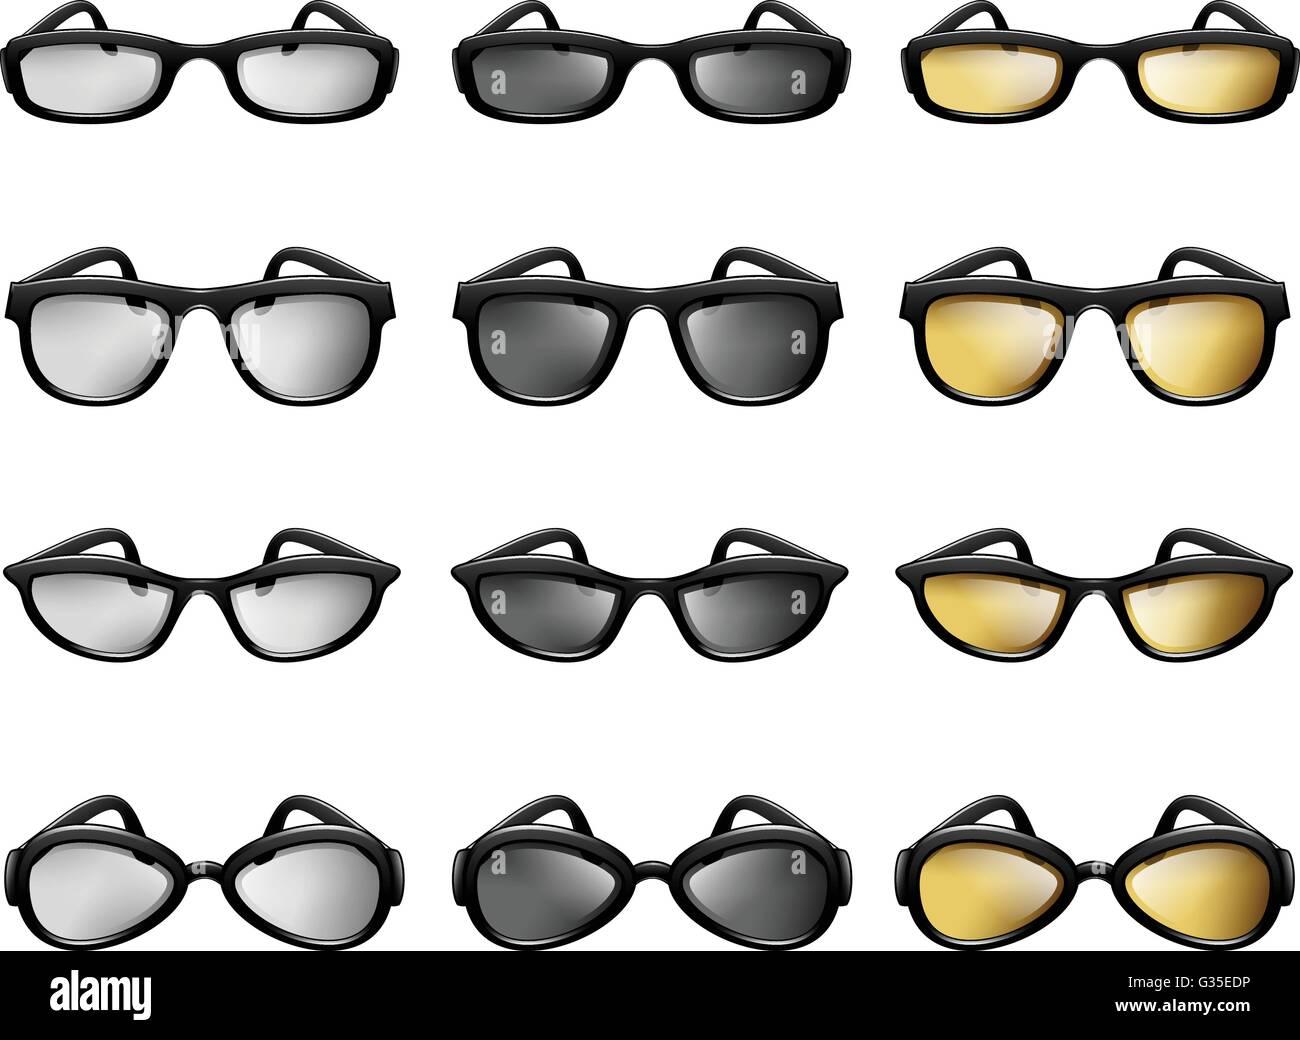 Eyewear, Eyeglass, Sunglass, Optometry, Fashion Accessories - Stock Image